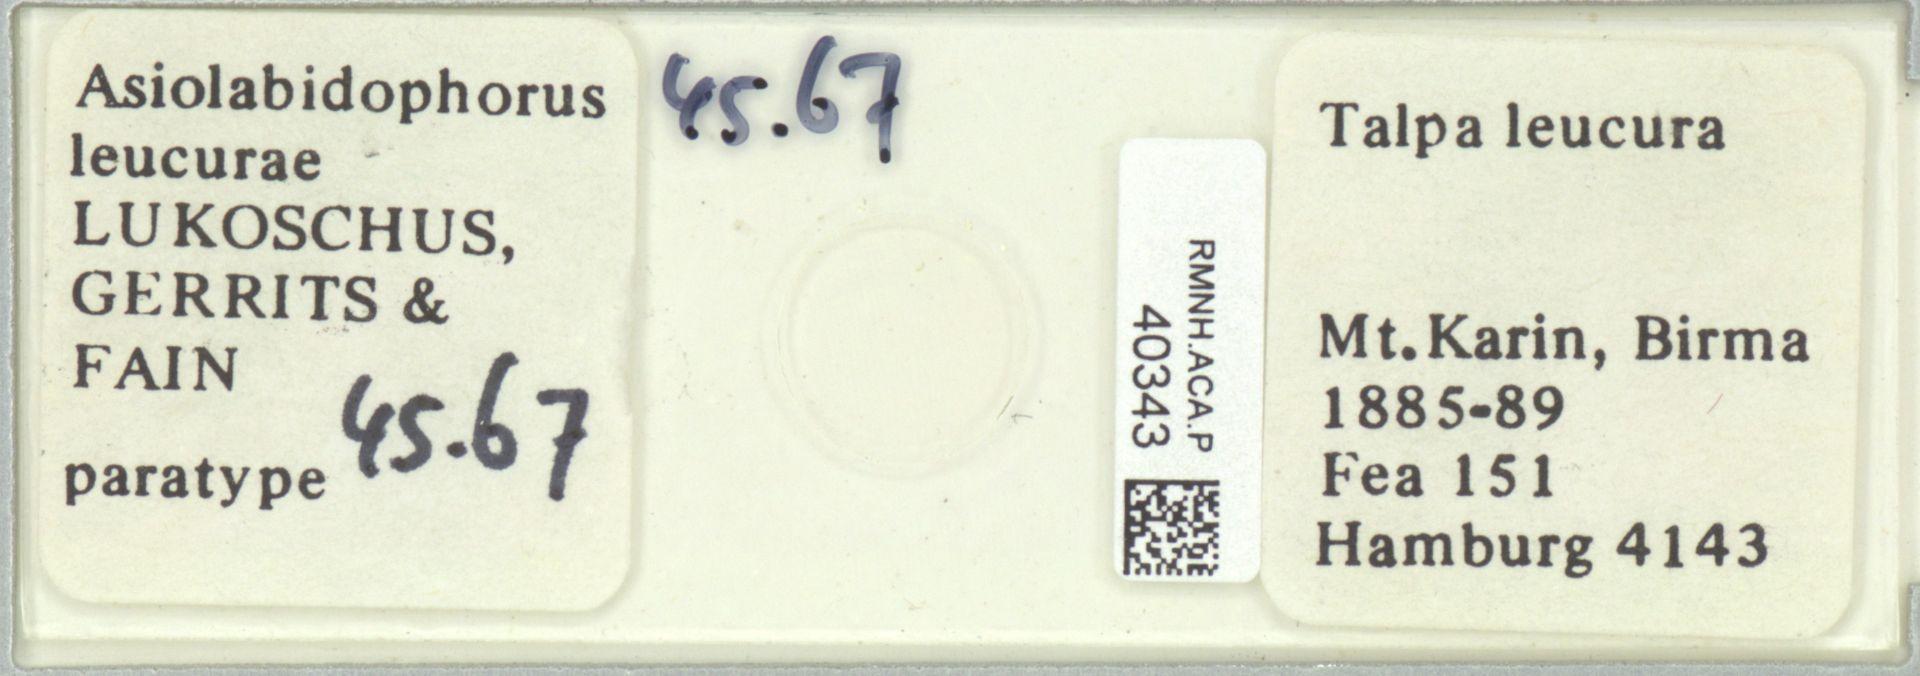 RMNH.ACA.P.40343 | Asiolabidophorus leucurae Lukoschus, Gerrits & Fain